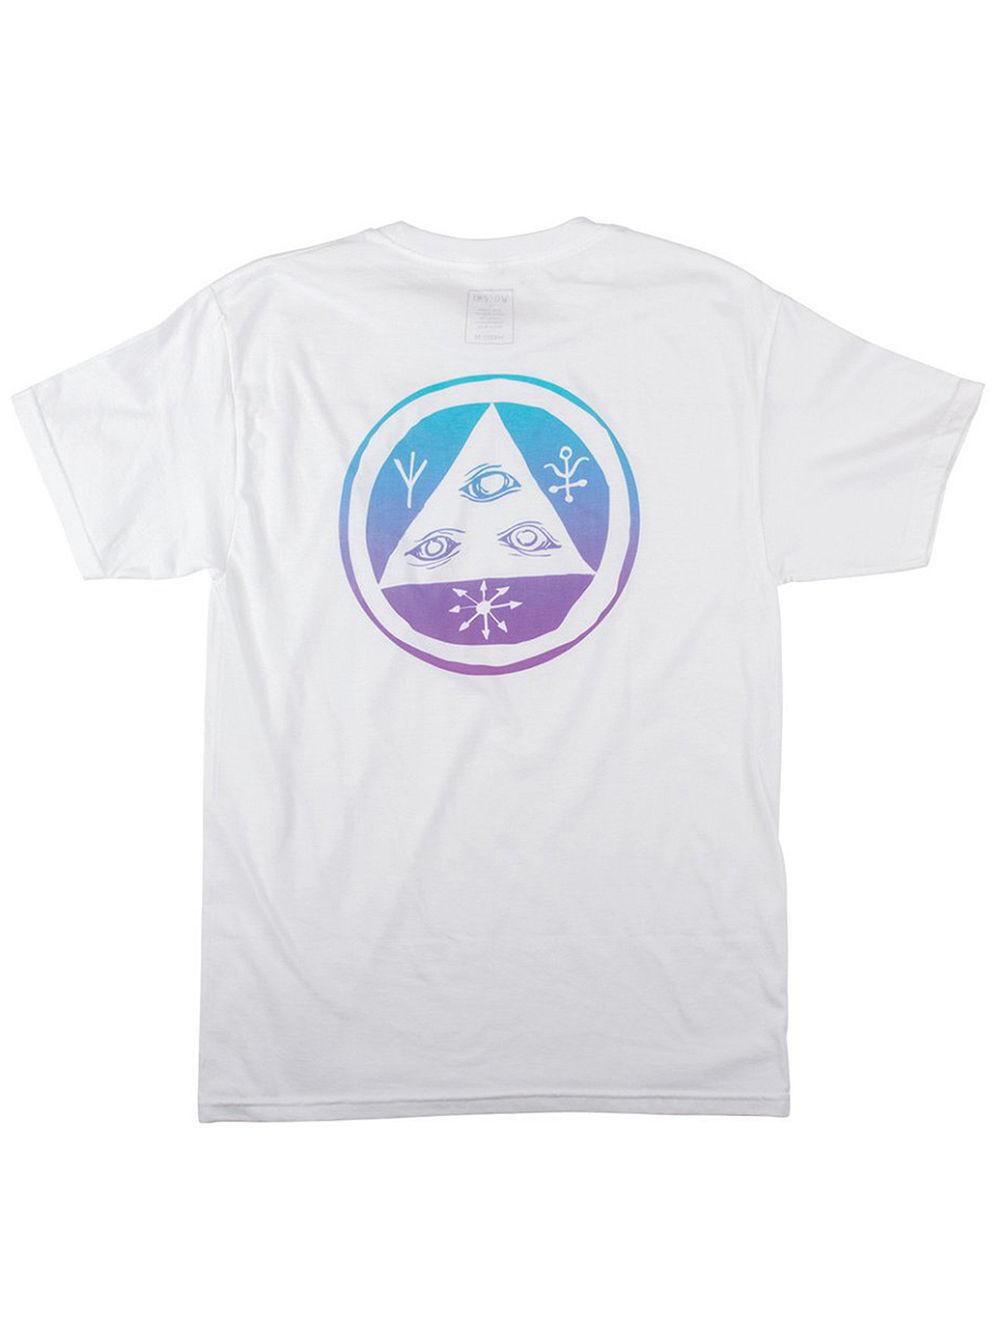 welcome-talisman-t-shirt